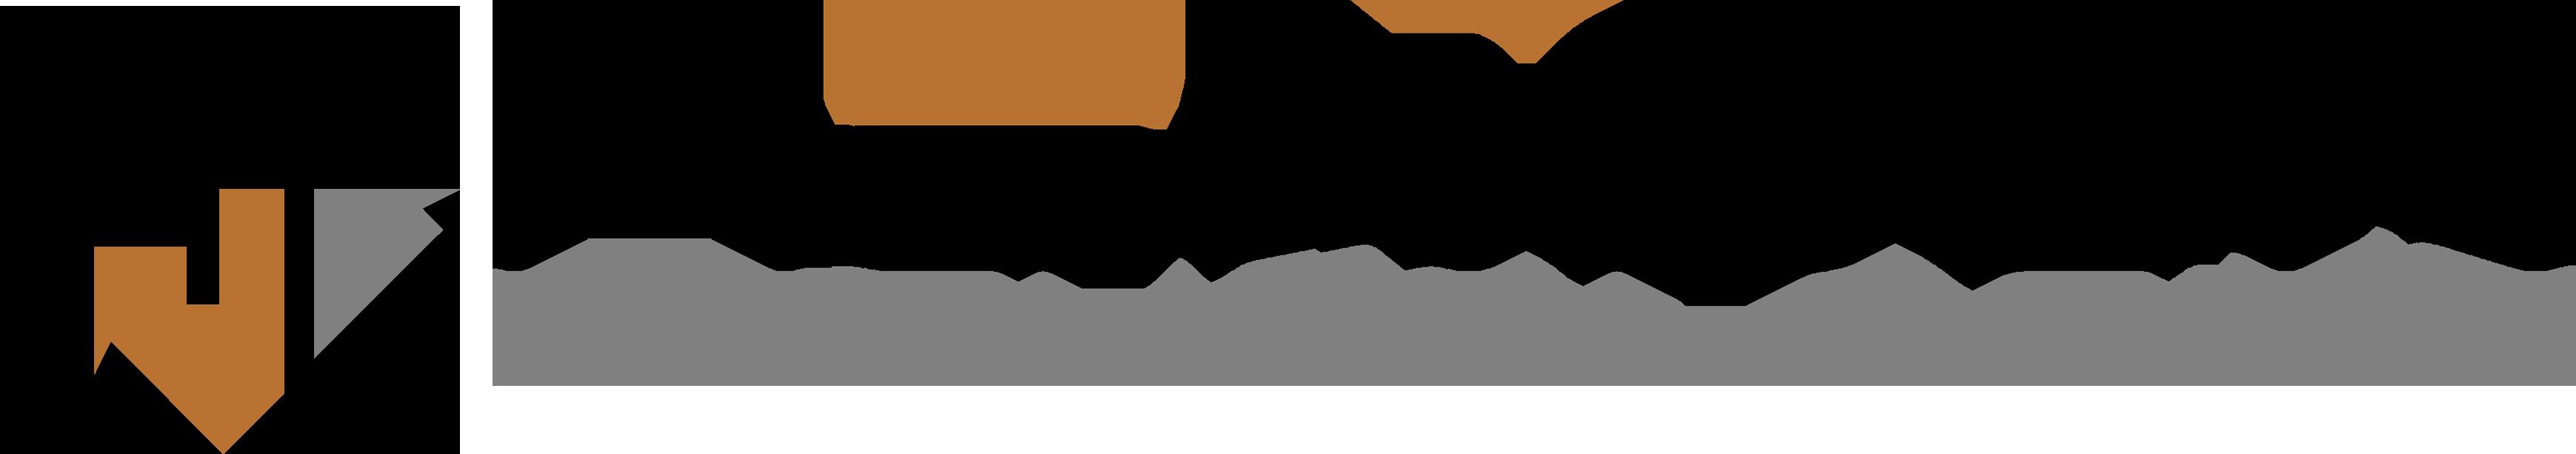 Henson Technologies